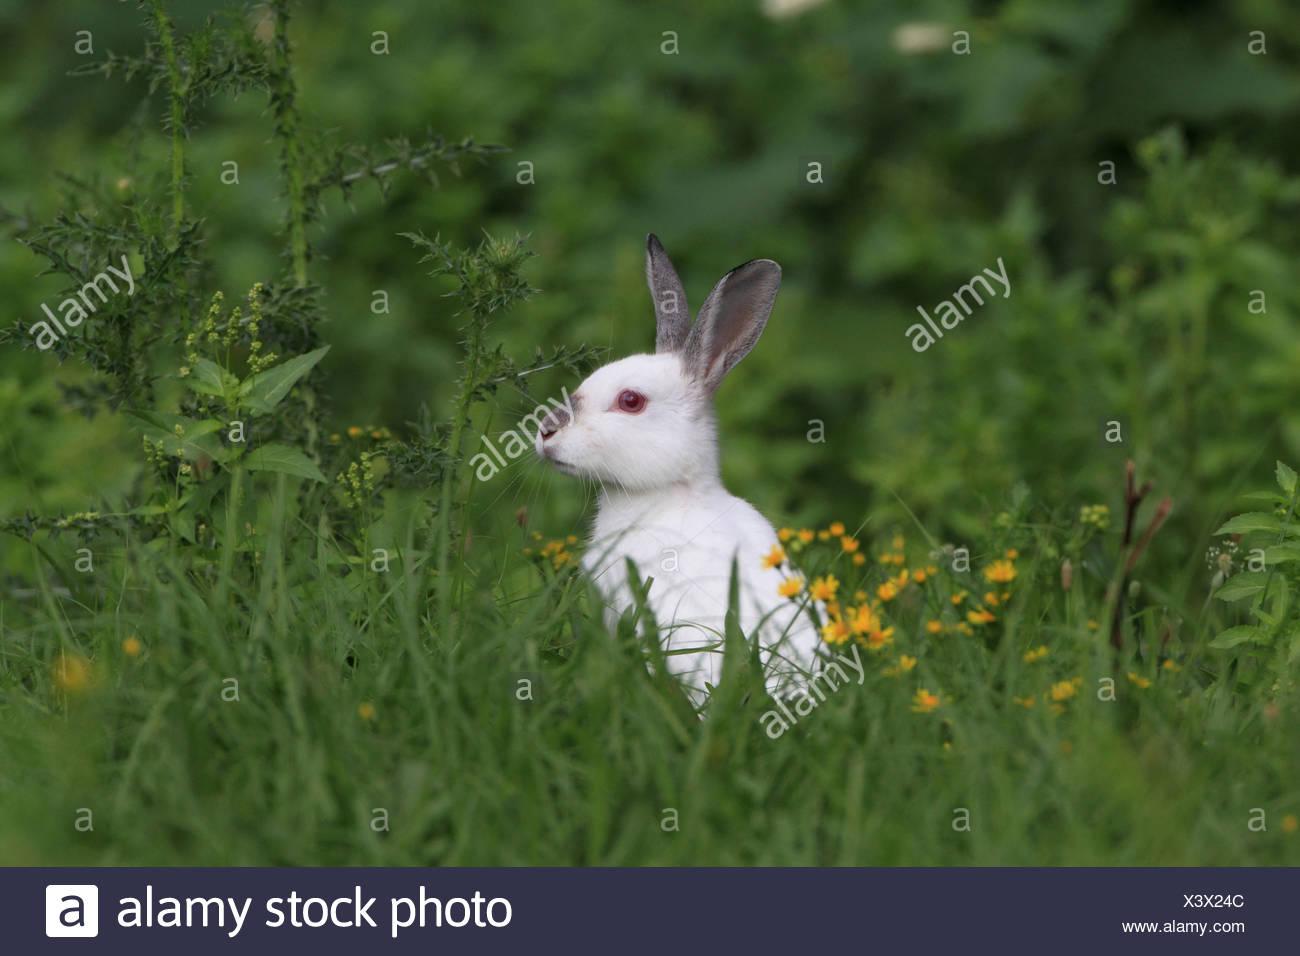 European rabbit (Oryctolagus cuniculus), albino - Stock Image